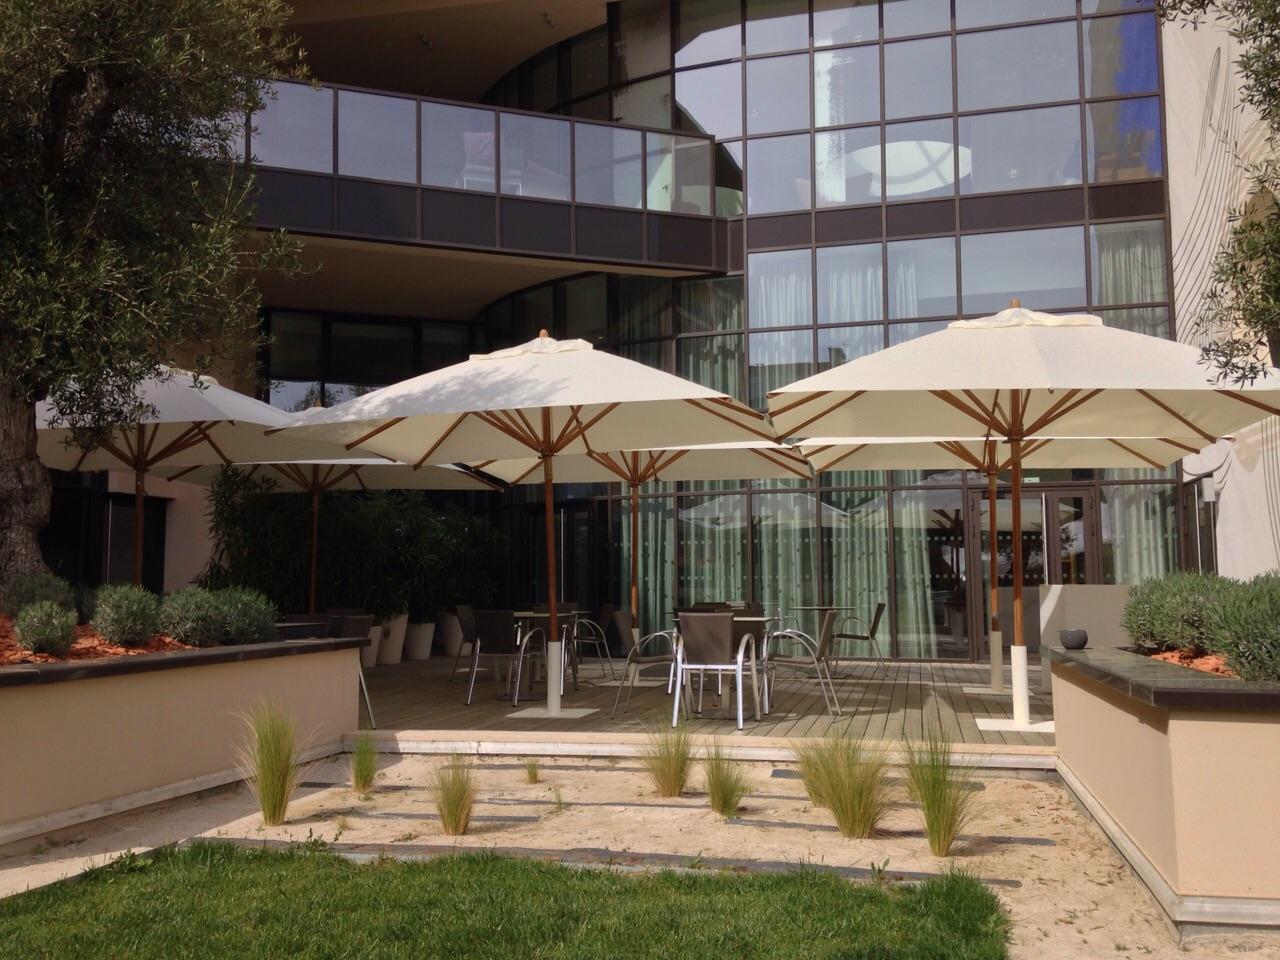 Bambrella Levante 3.4m Square Parasols - Marriott Hotel France